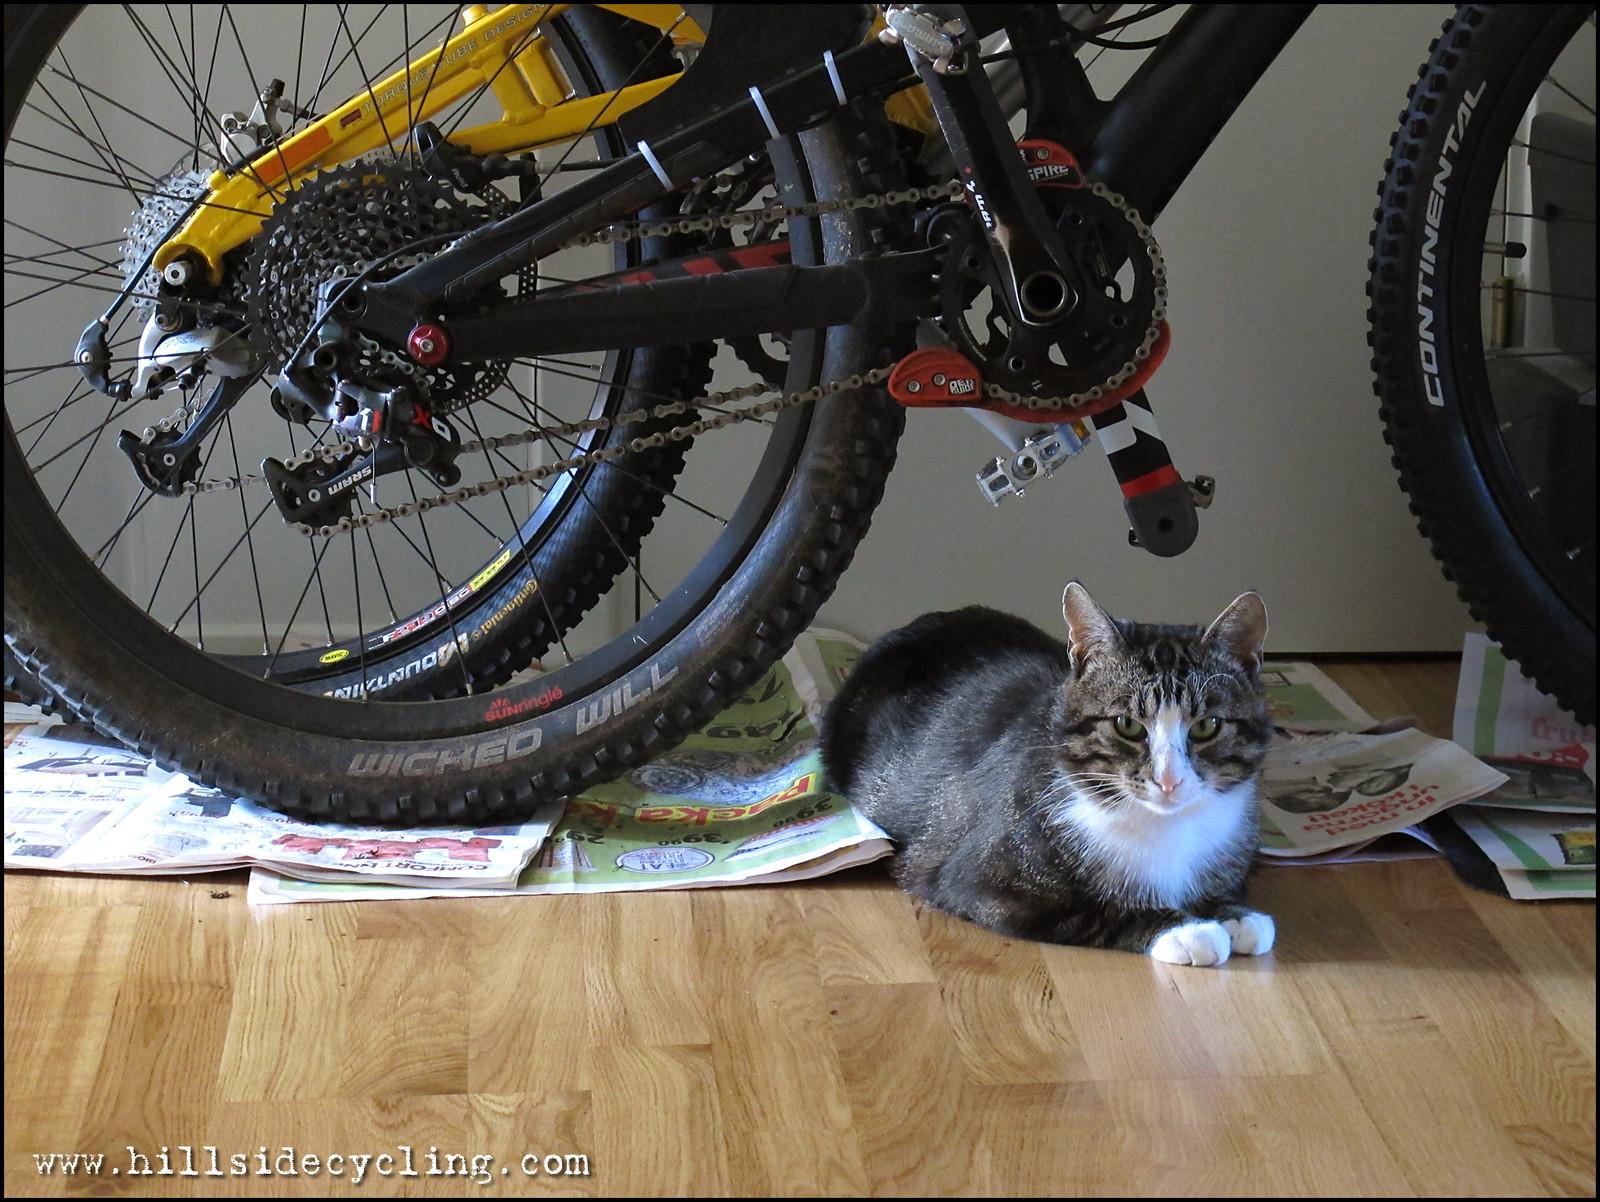 Trail Cat - Hillside Cycling - Mountain Biking Pictures - Vital MTB